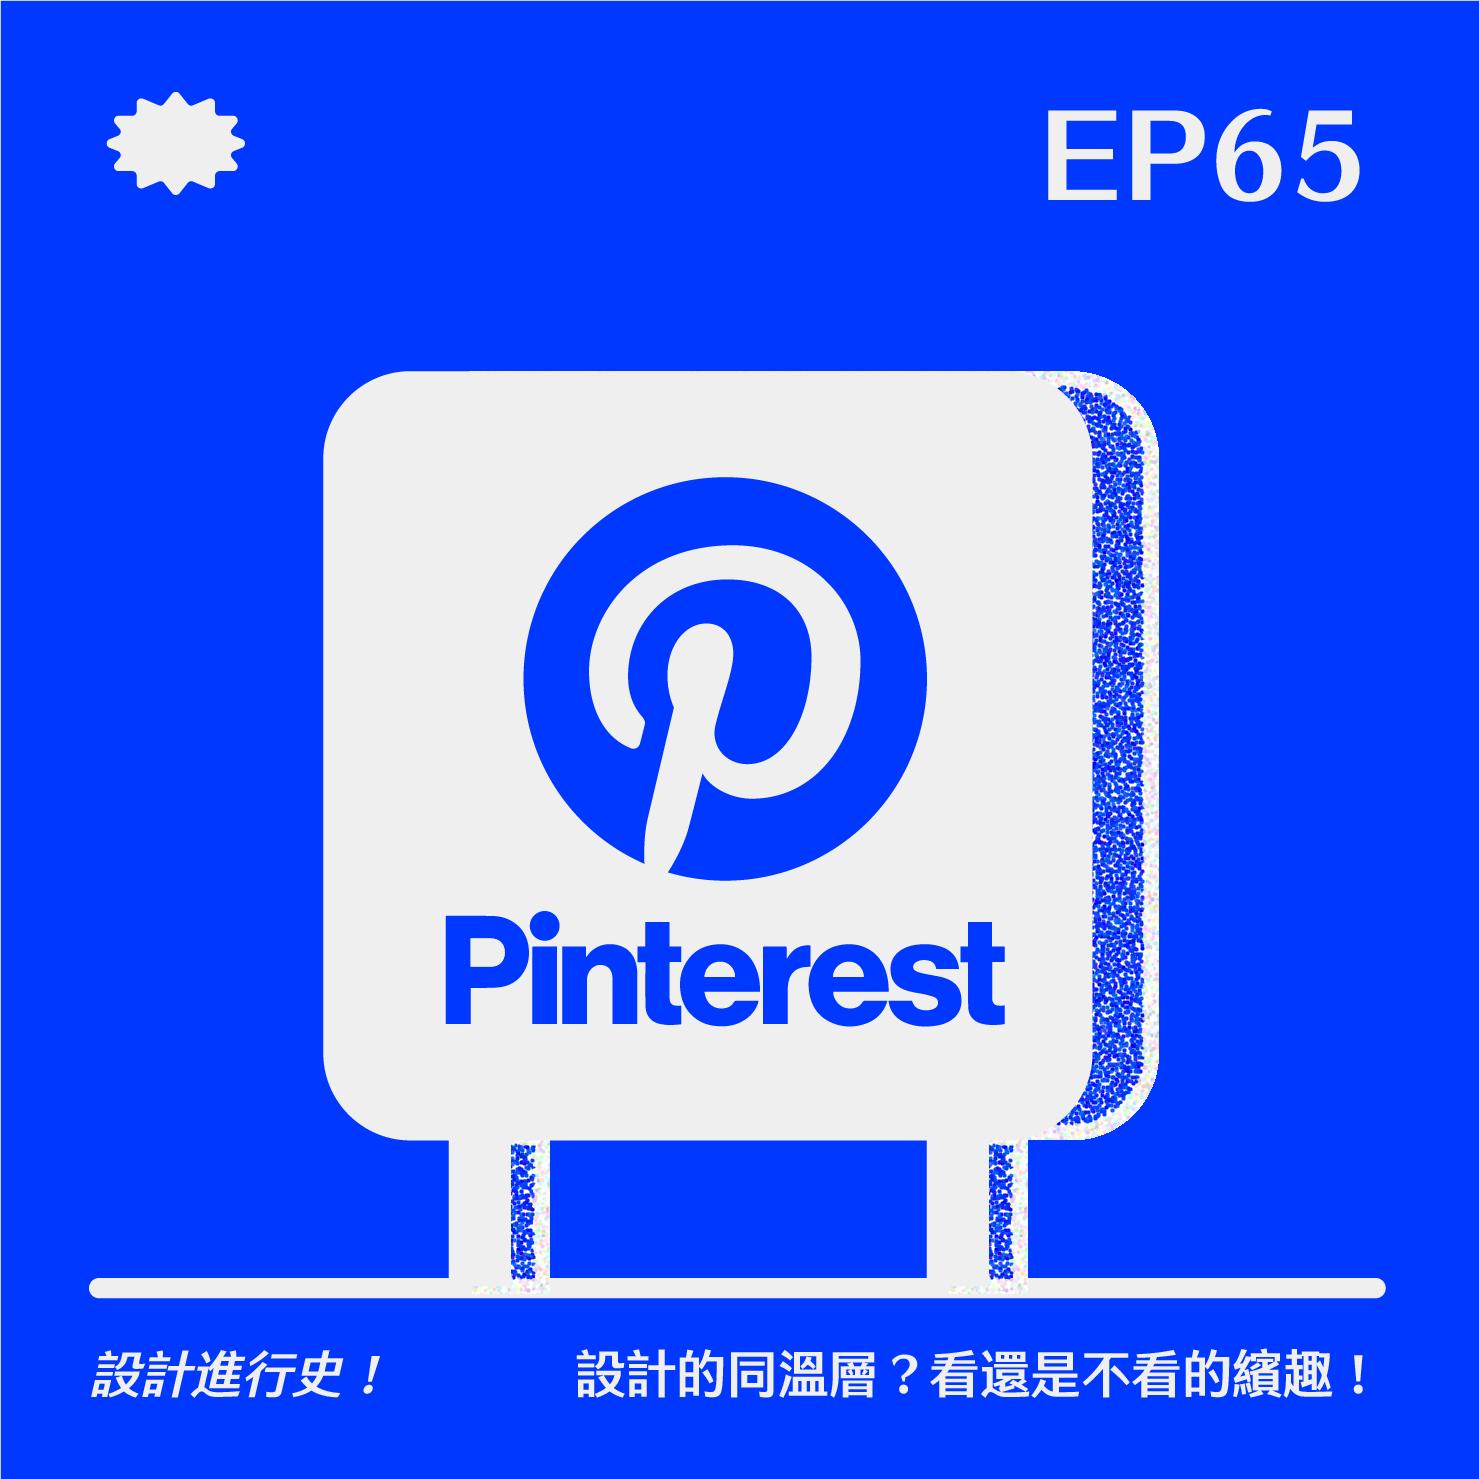 EP.65 [設計進行史] 設計的同溫層,過濾後的美感,讓人又愛又怕的繽趣 Pinterest!